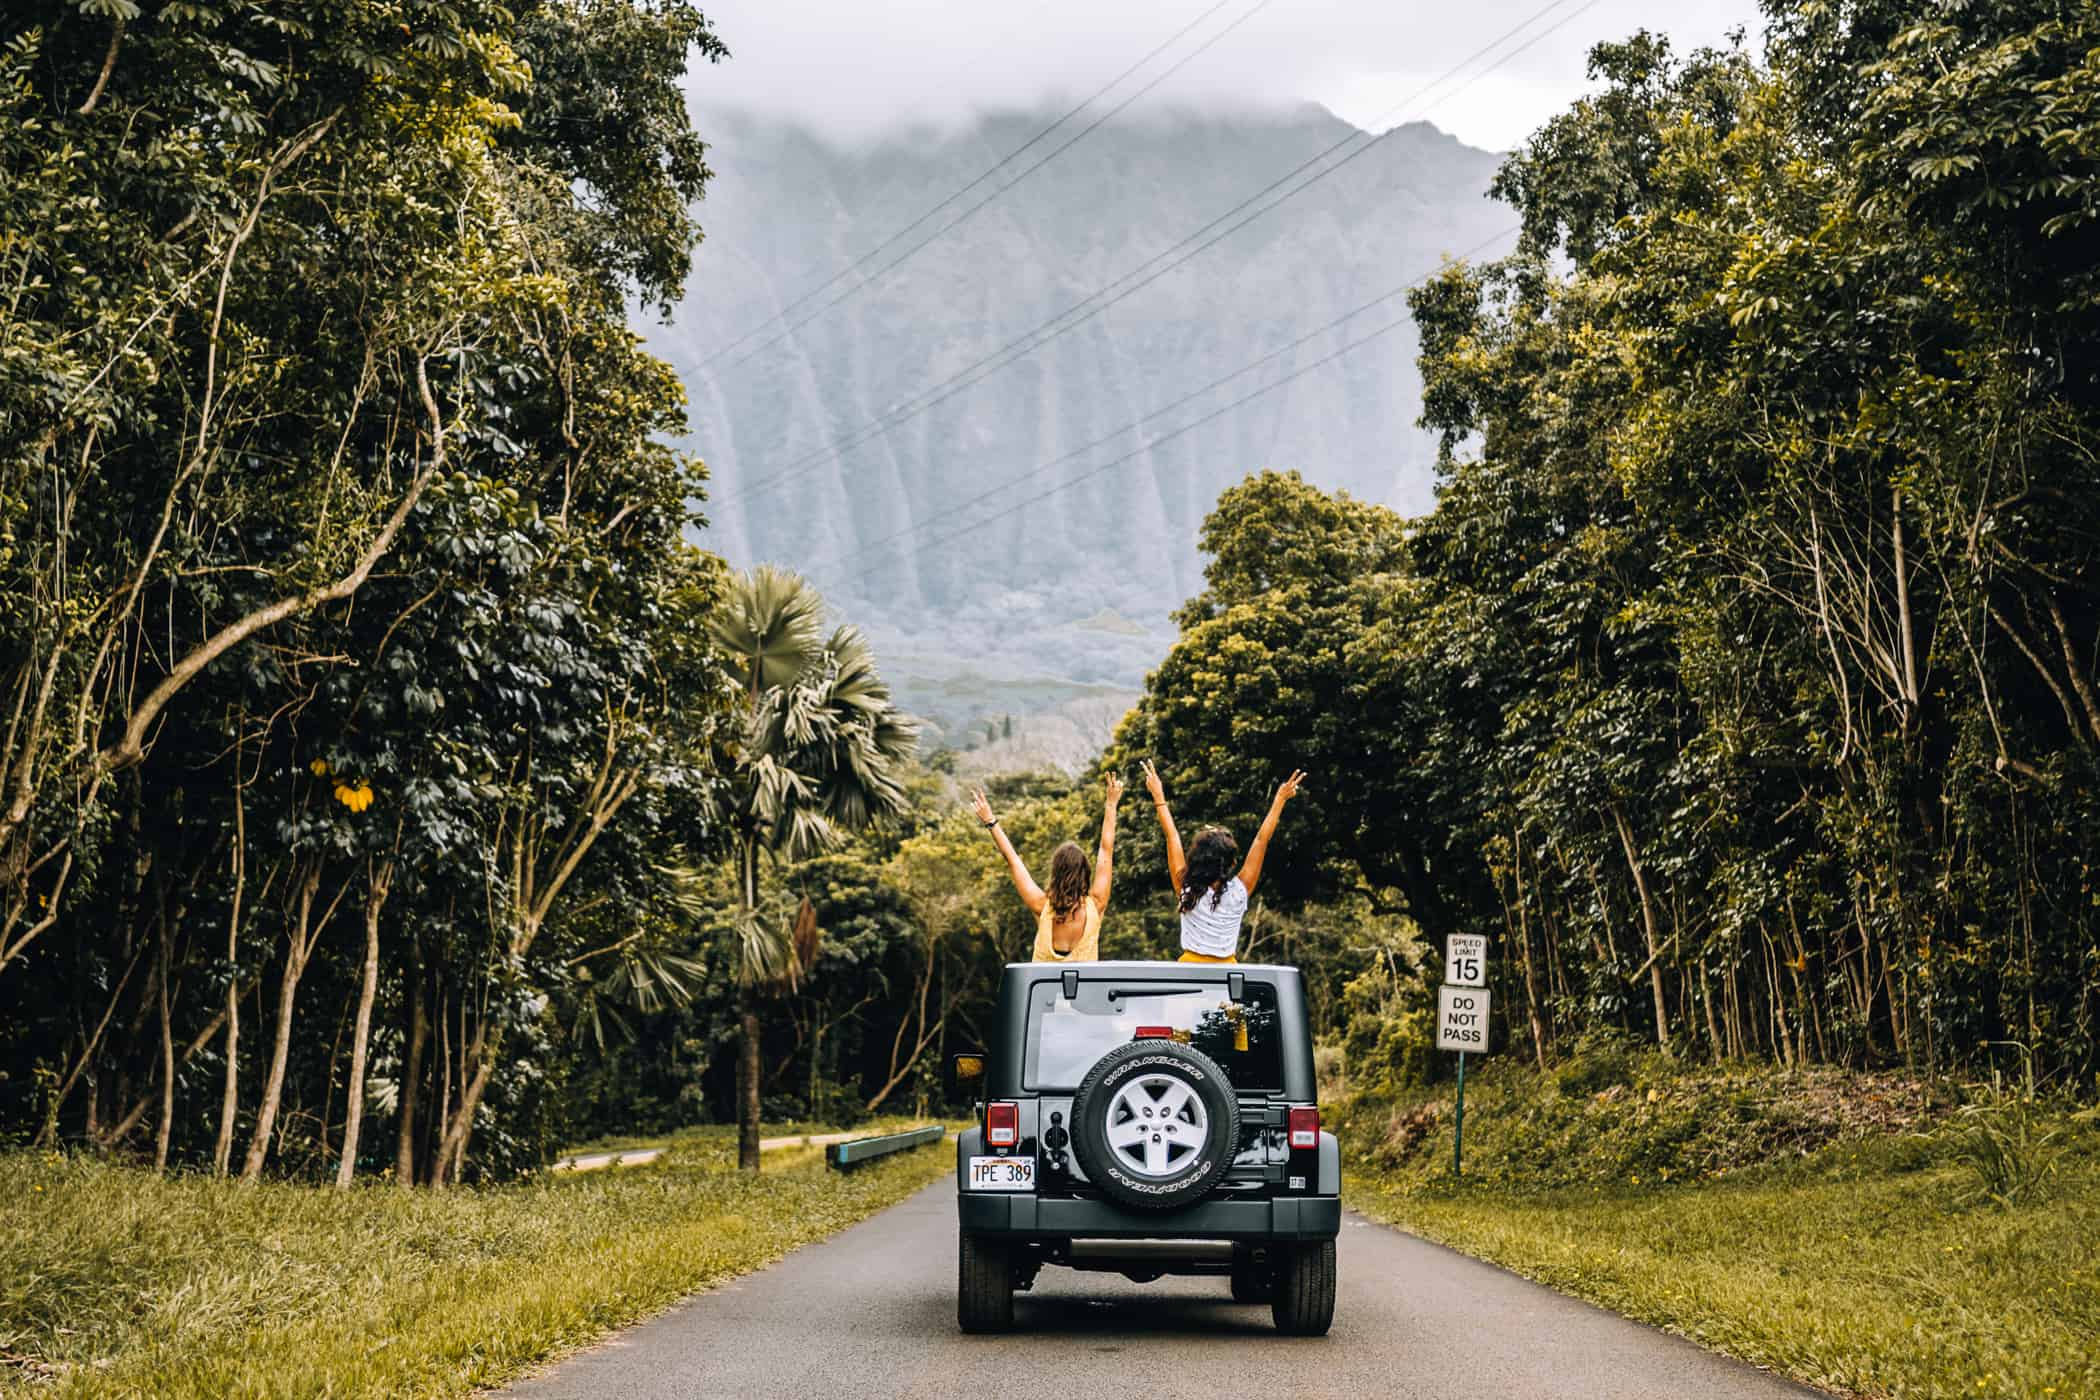 Hawaii Urlaub: Mietwagen